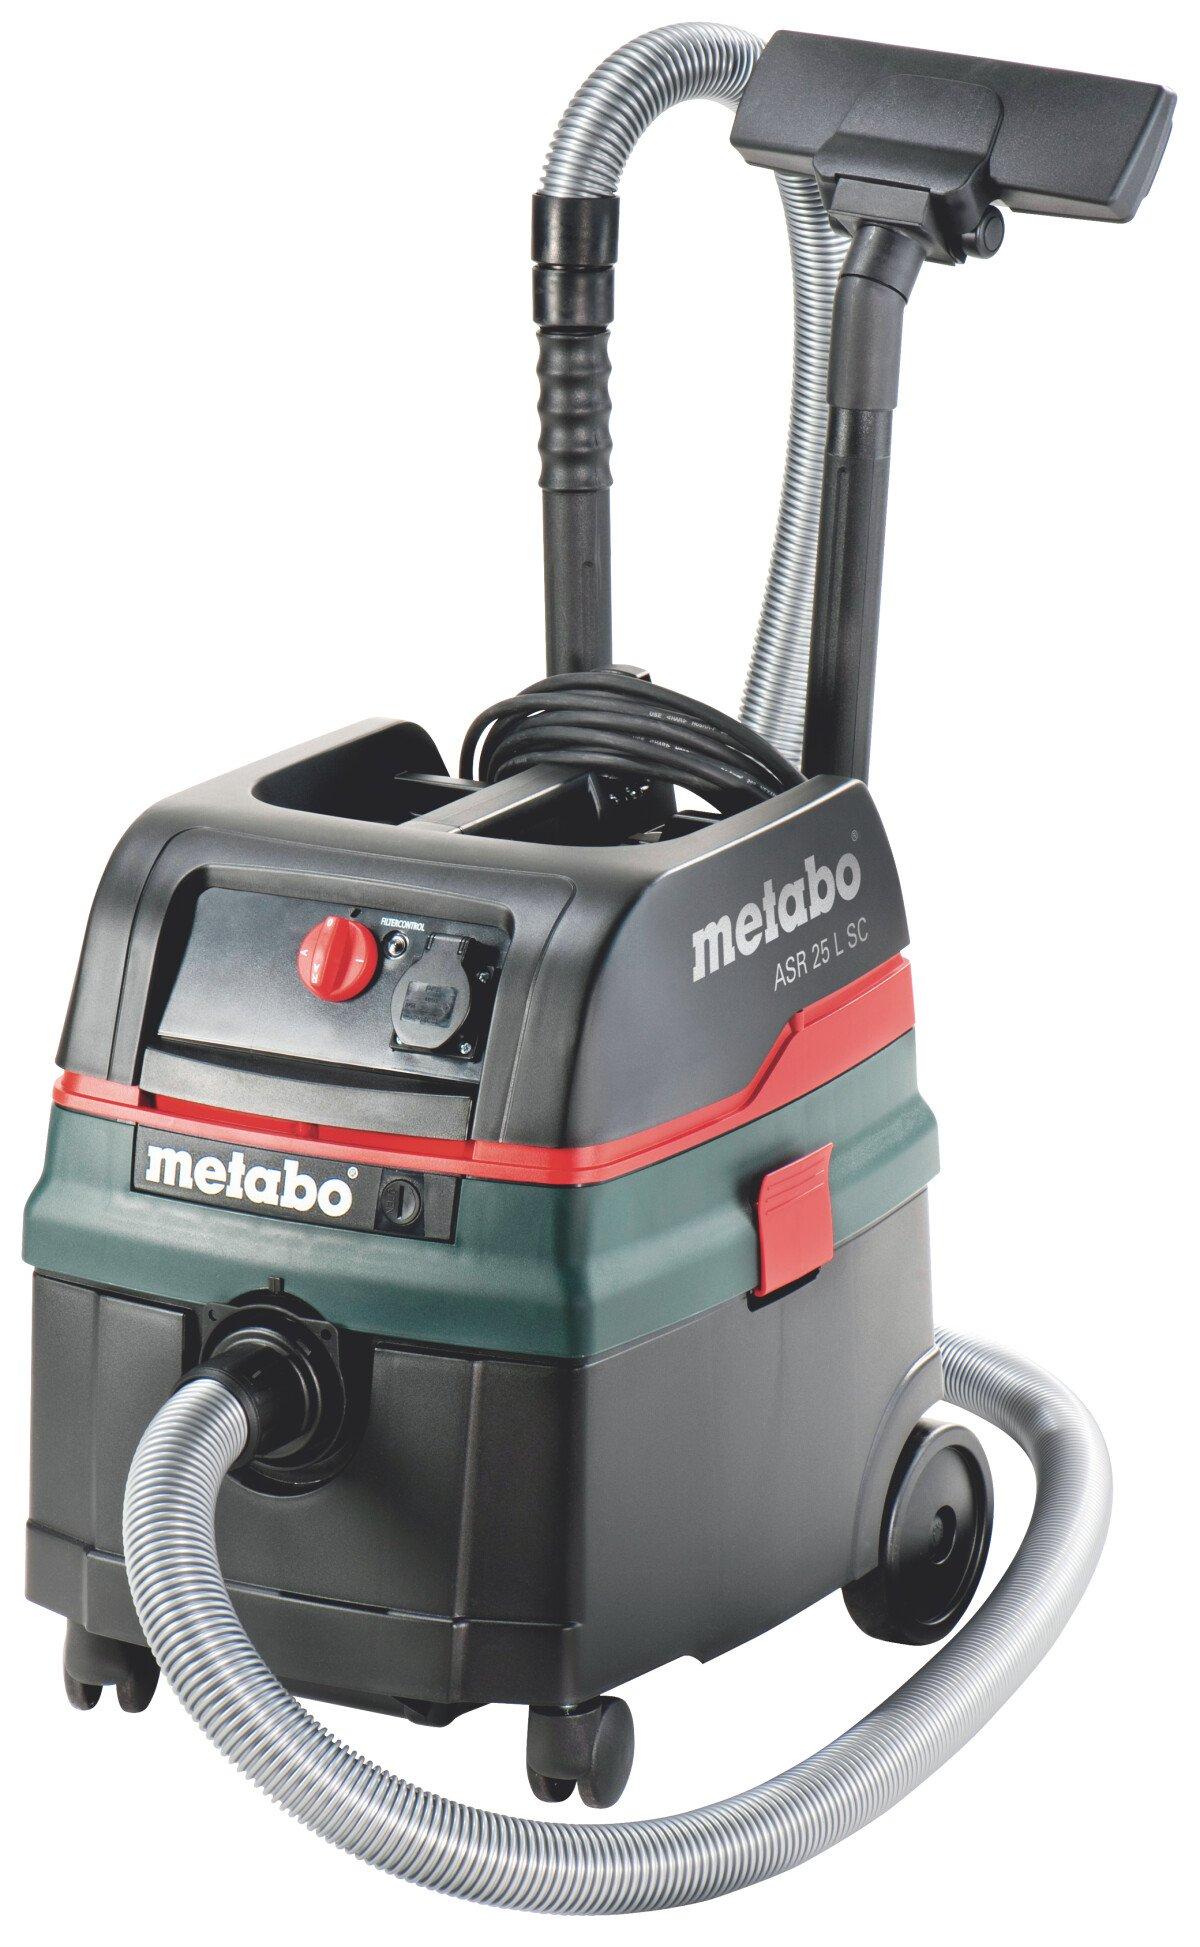 Metabo Ex Demo ASR25LSC 110v 1400 Watt Multi-Purpose Vacuum Cleaner (+ Auto Take Off) Replaces ASR2025